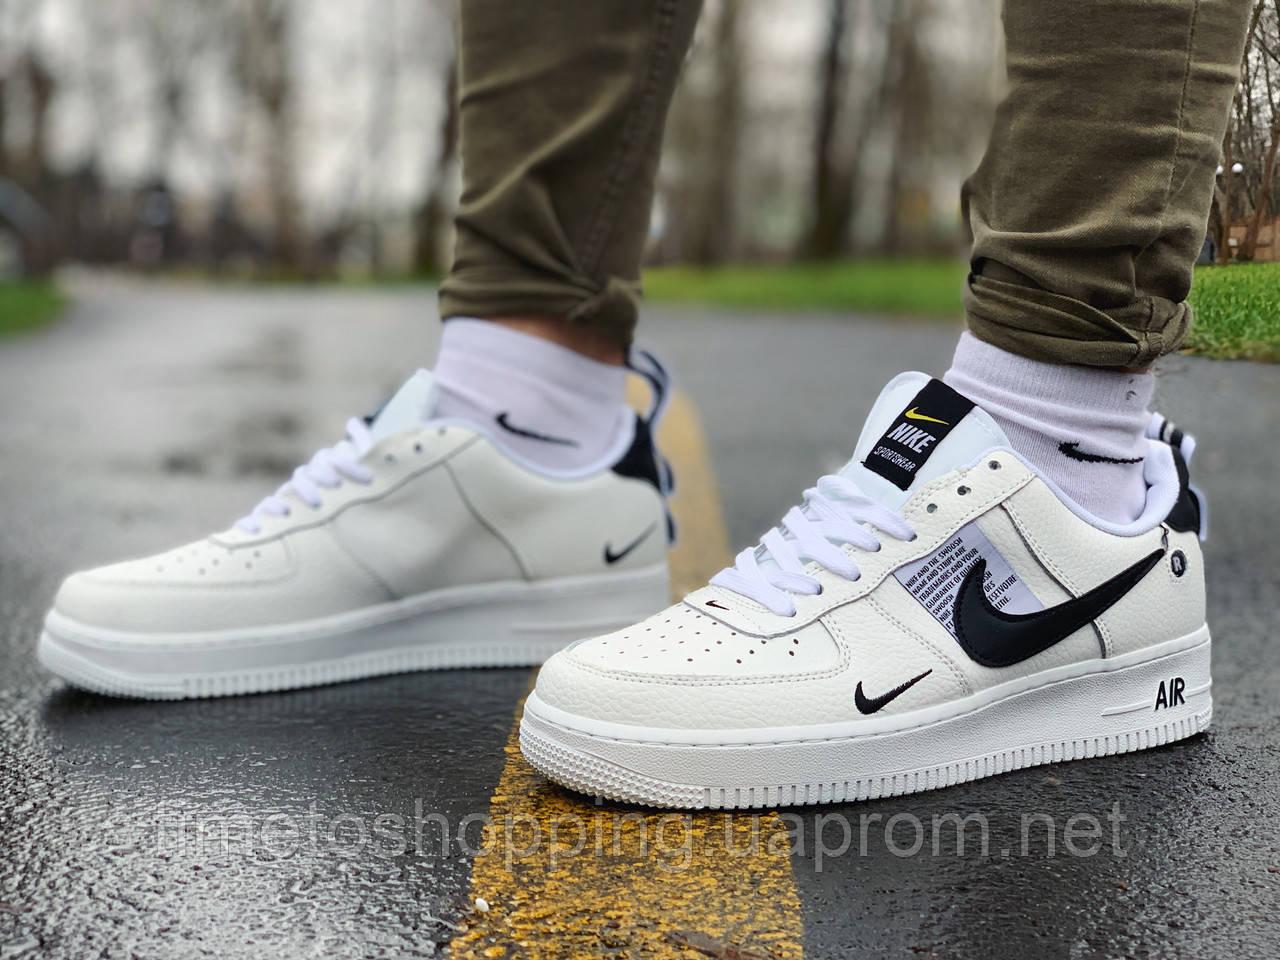 Кроссовки натуральная кожа Nike Air Force Найк Аир Форс(41,42,43,44,45)